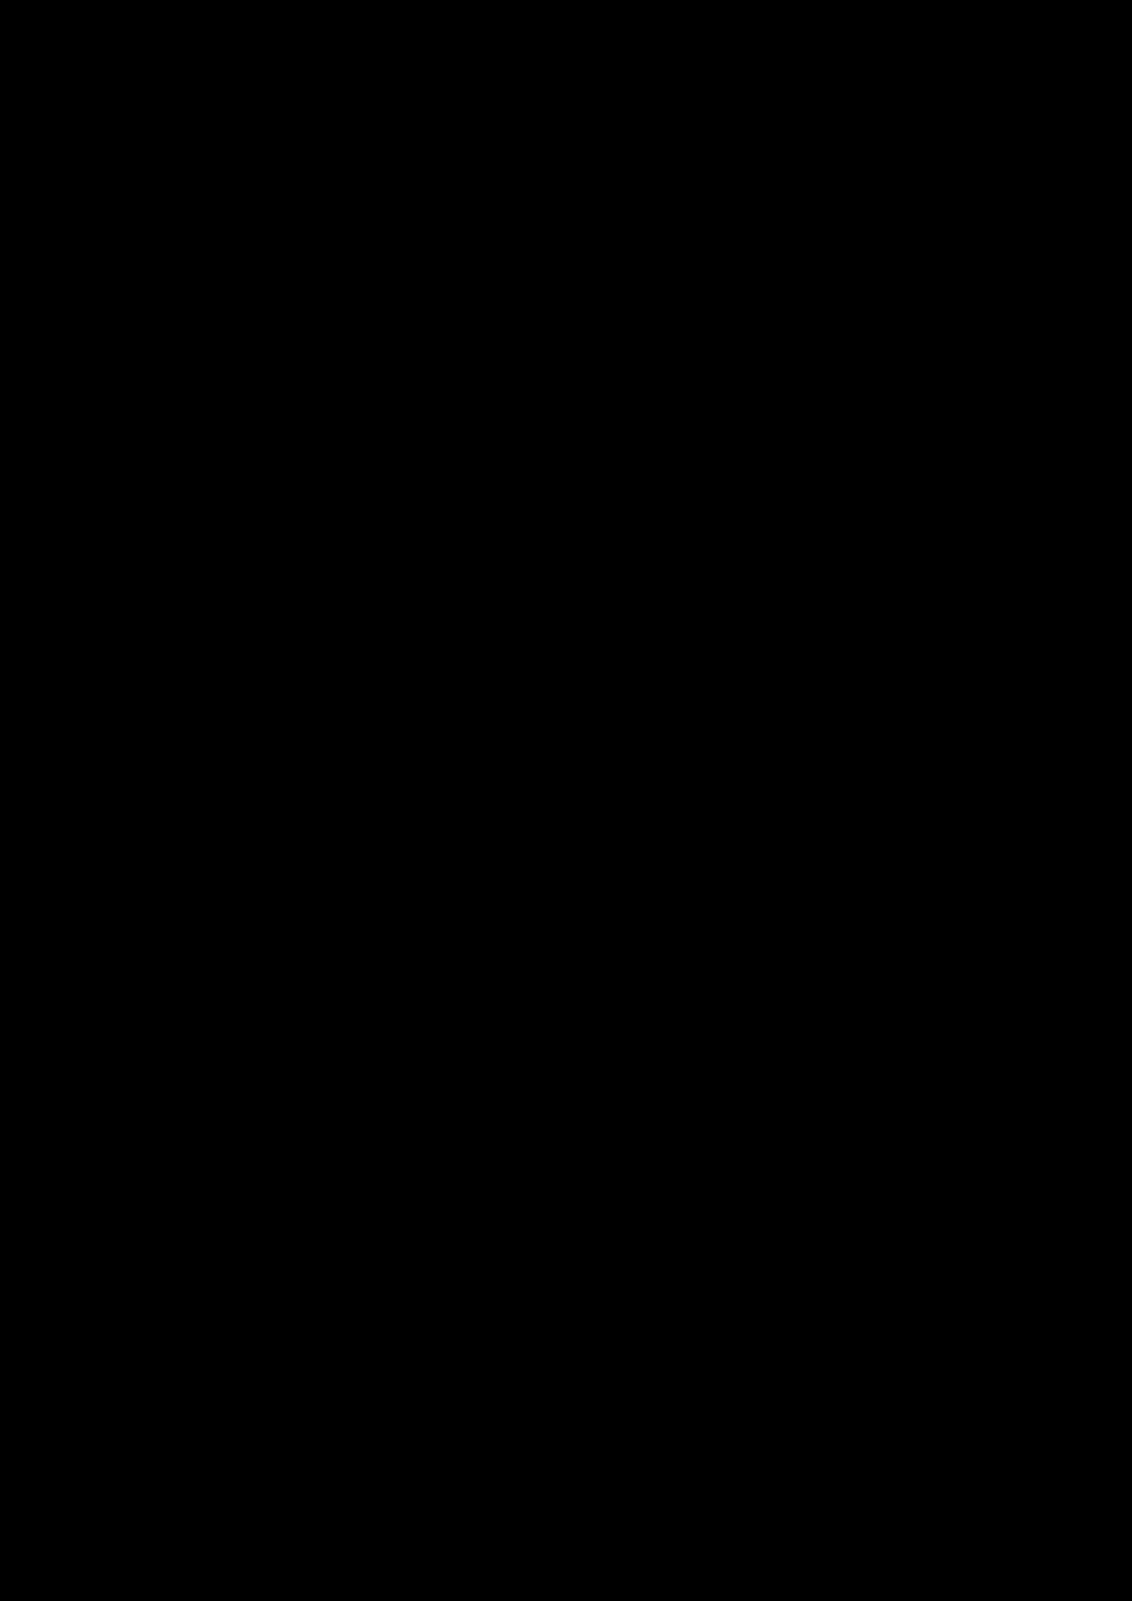 Belyiy sokol slide, Image 44